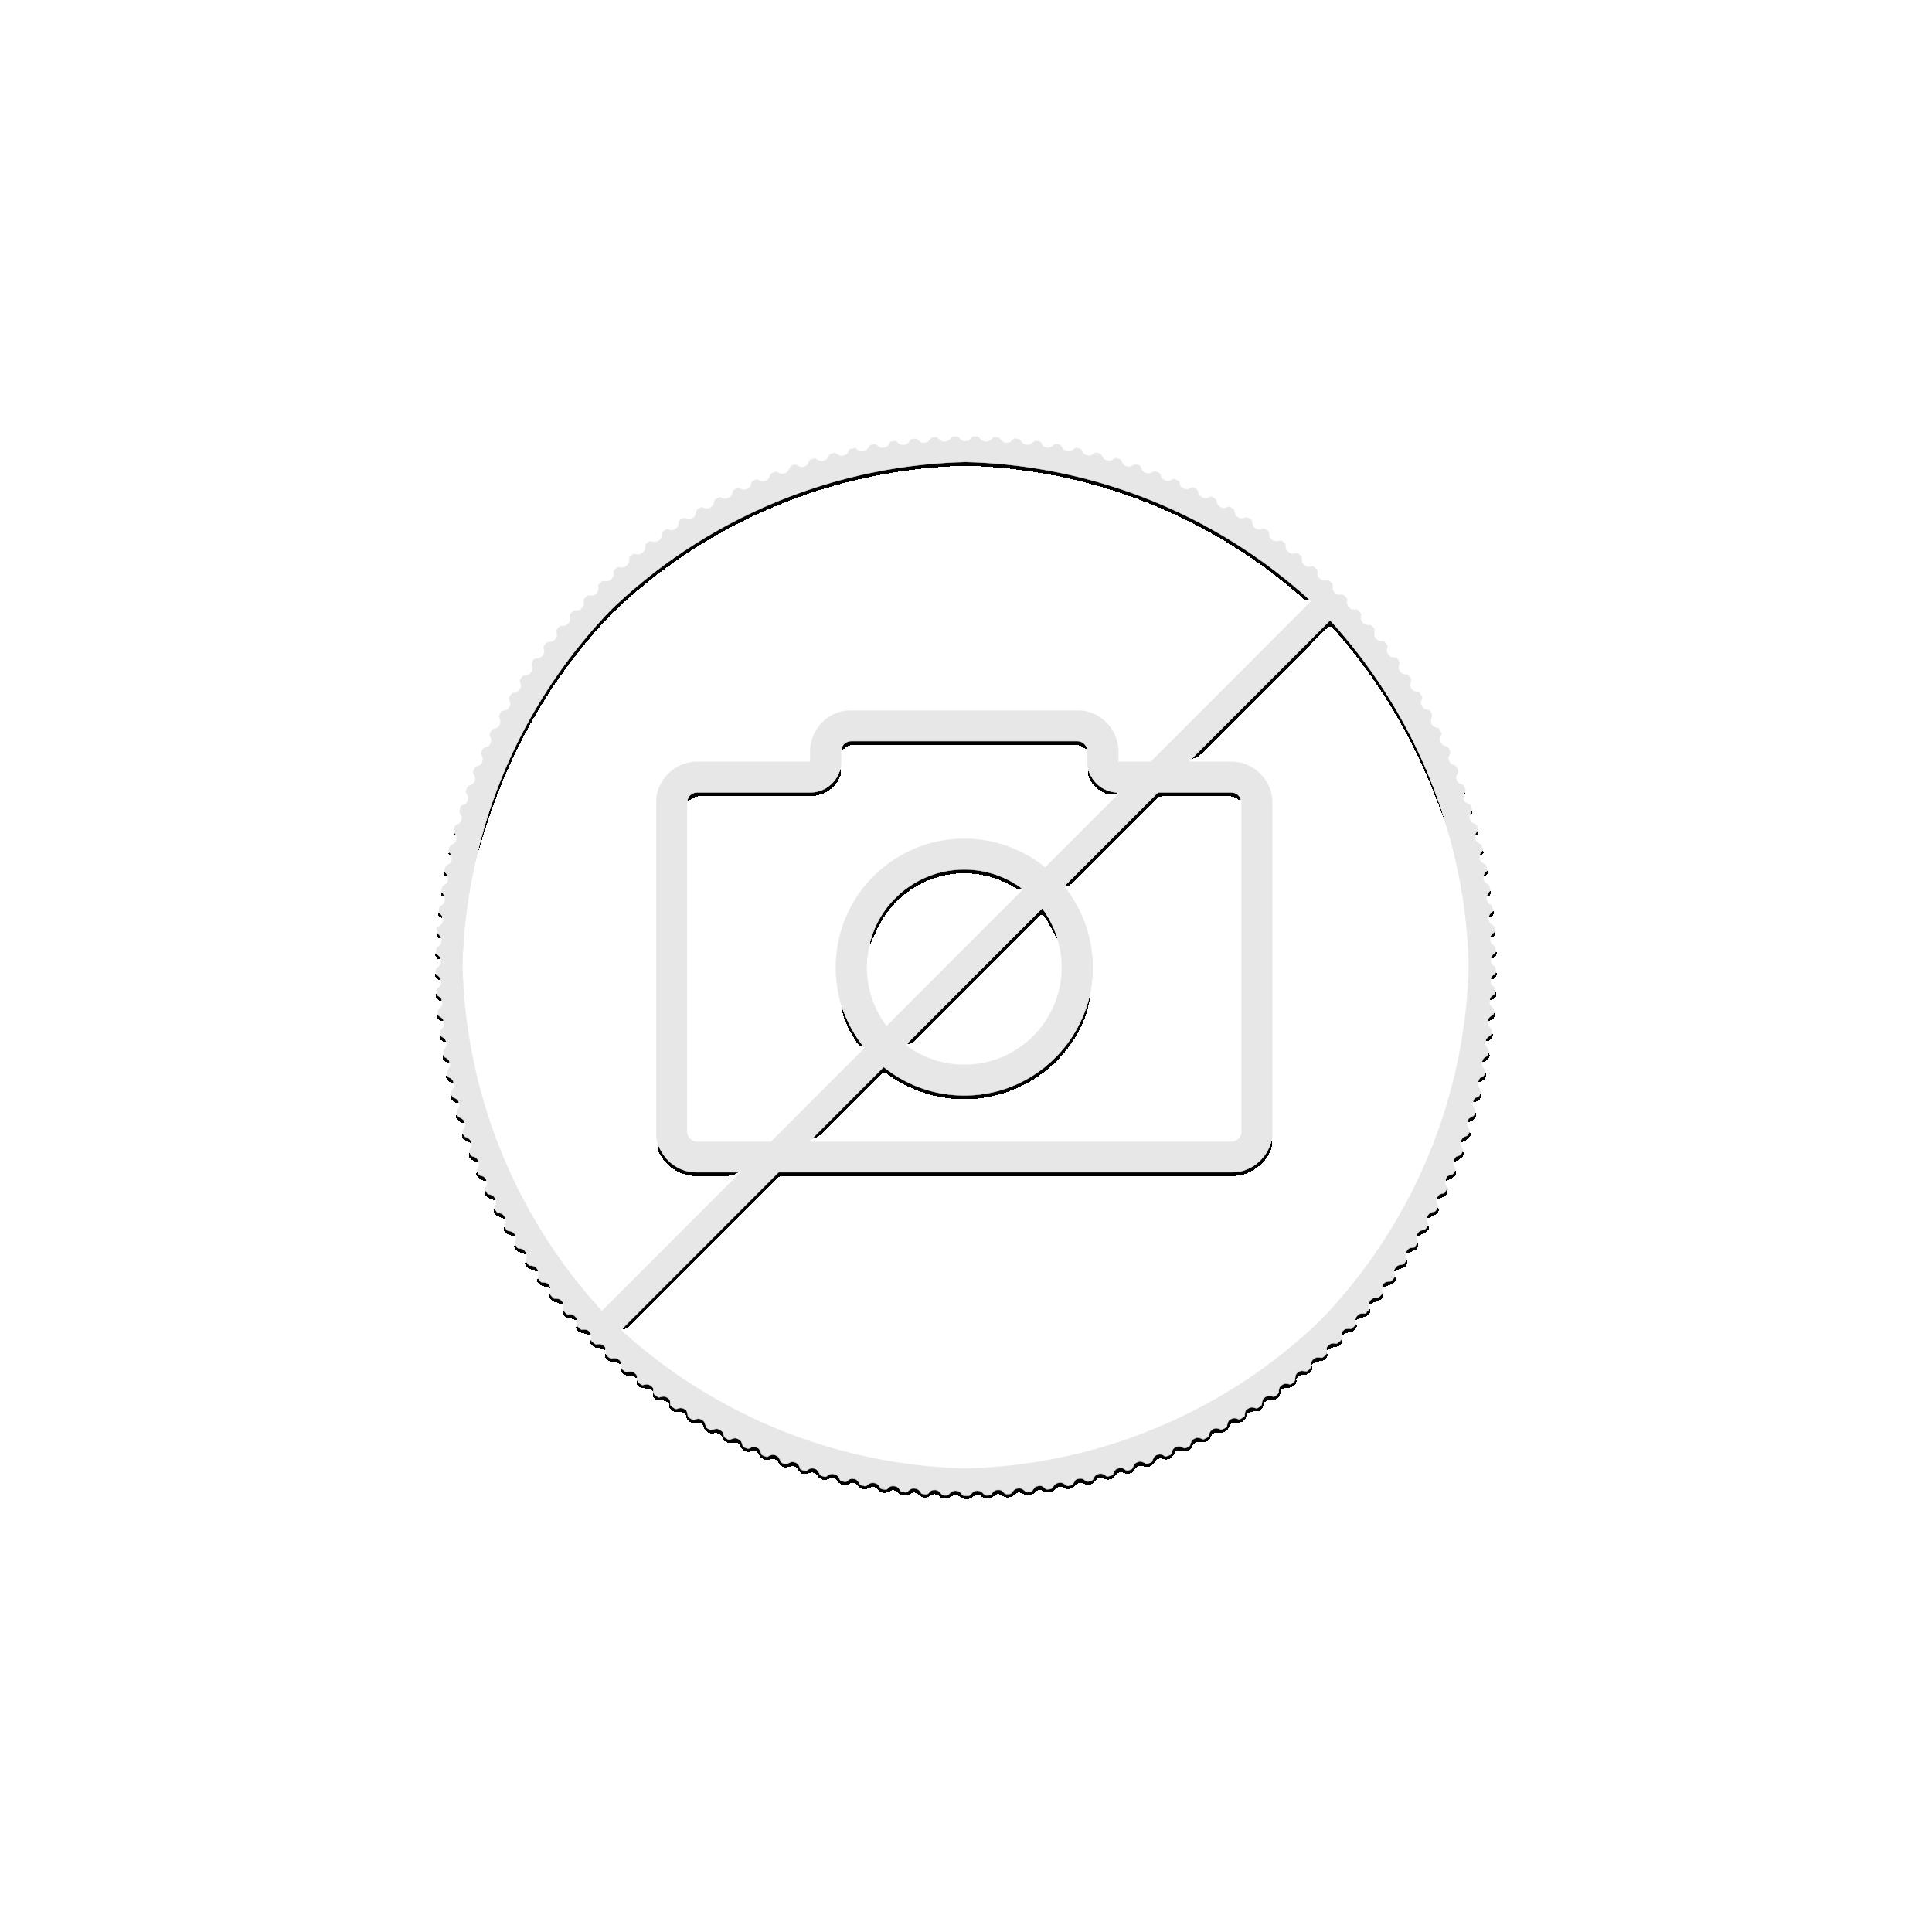 2 troy ounce zilveren munt Gray Wolf - antieke afwerking 2020